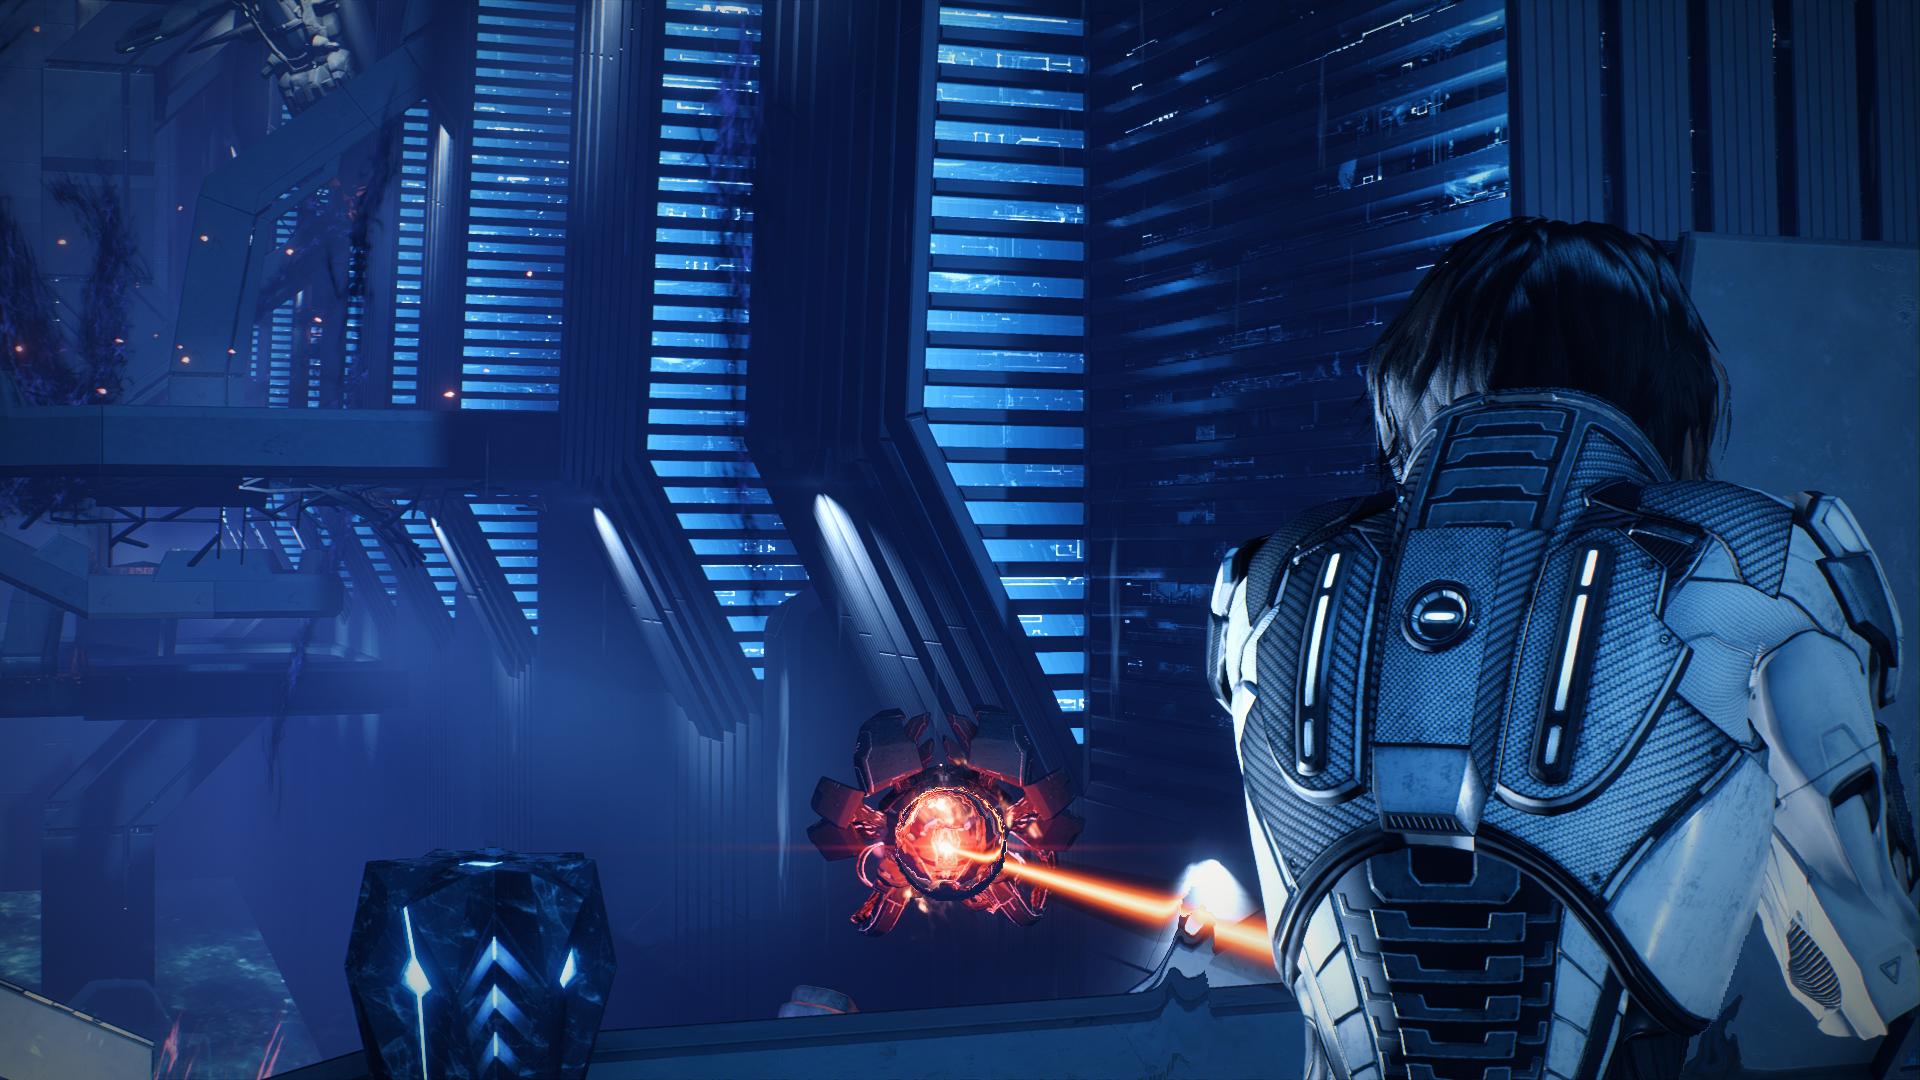 Mass Effect Andromeda Screenshot 2017.08.06 - 01.00.16.75.png - Mass Effect: Andromeda